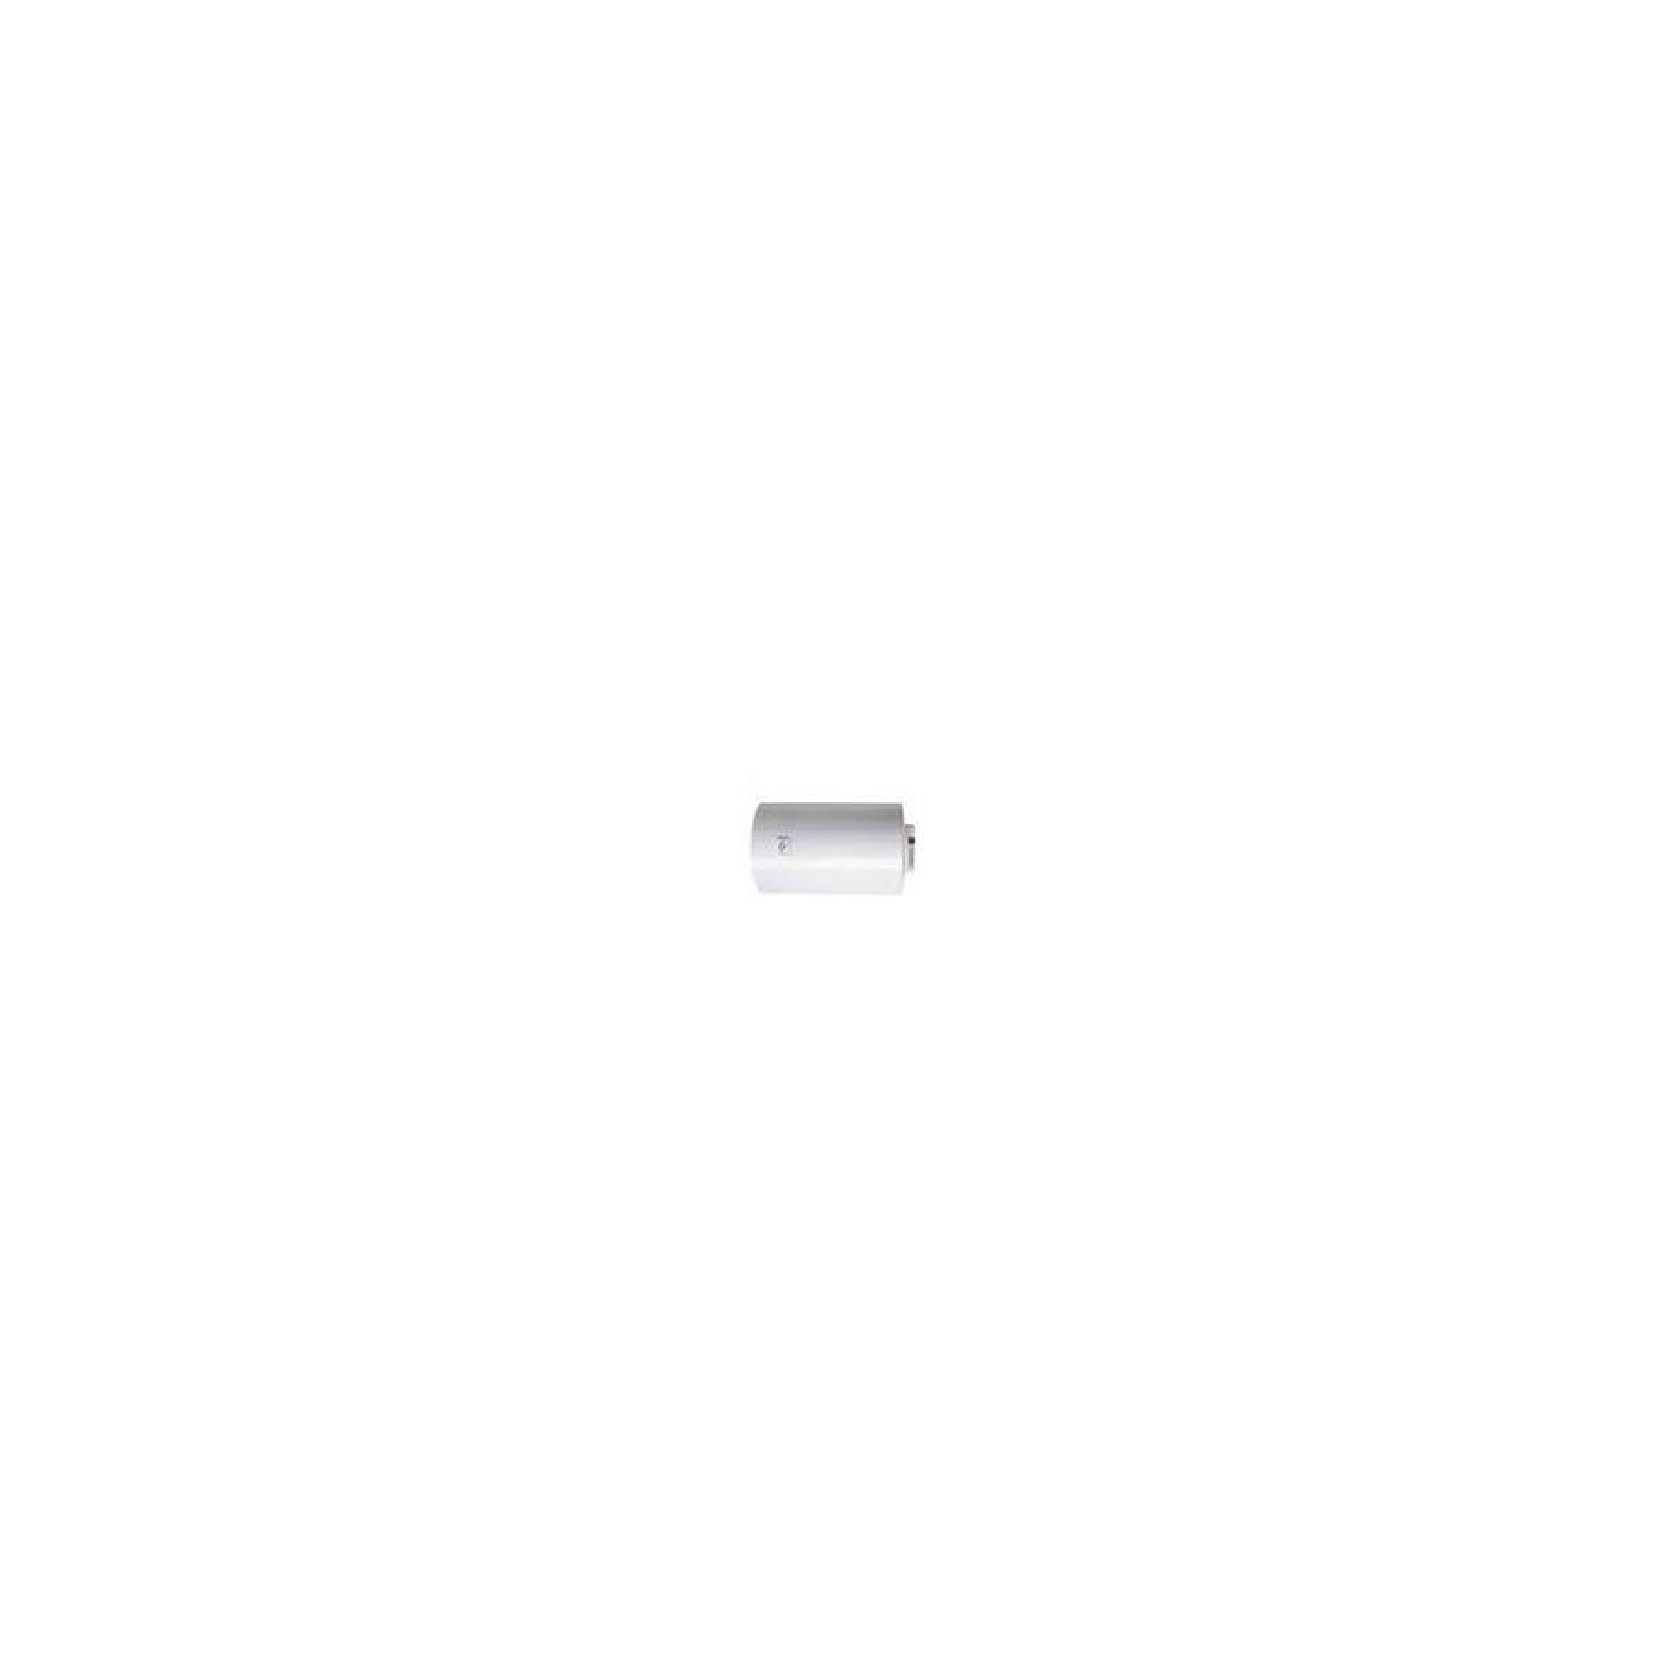 Scaldabagno elettrico ariston blur80h orizzontale for Amazon scaldabagni elettrici